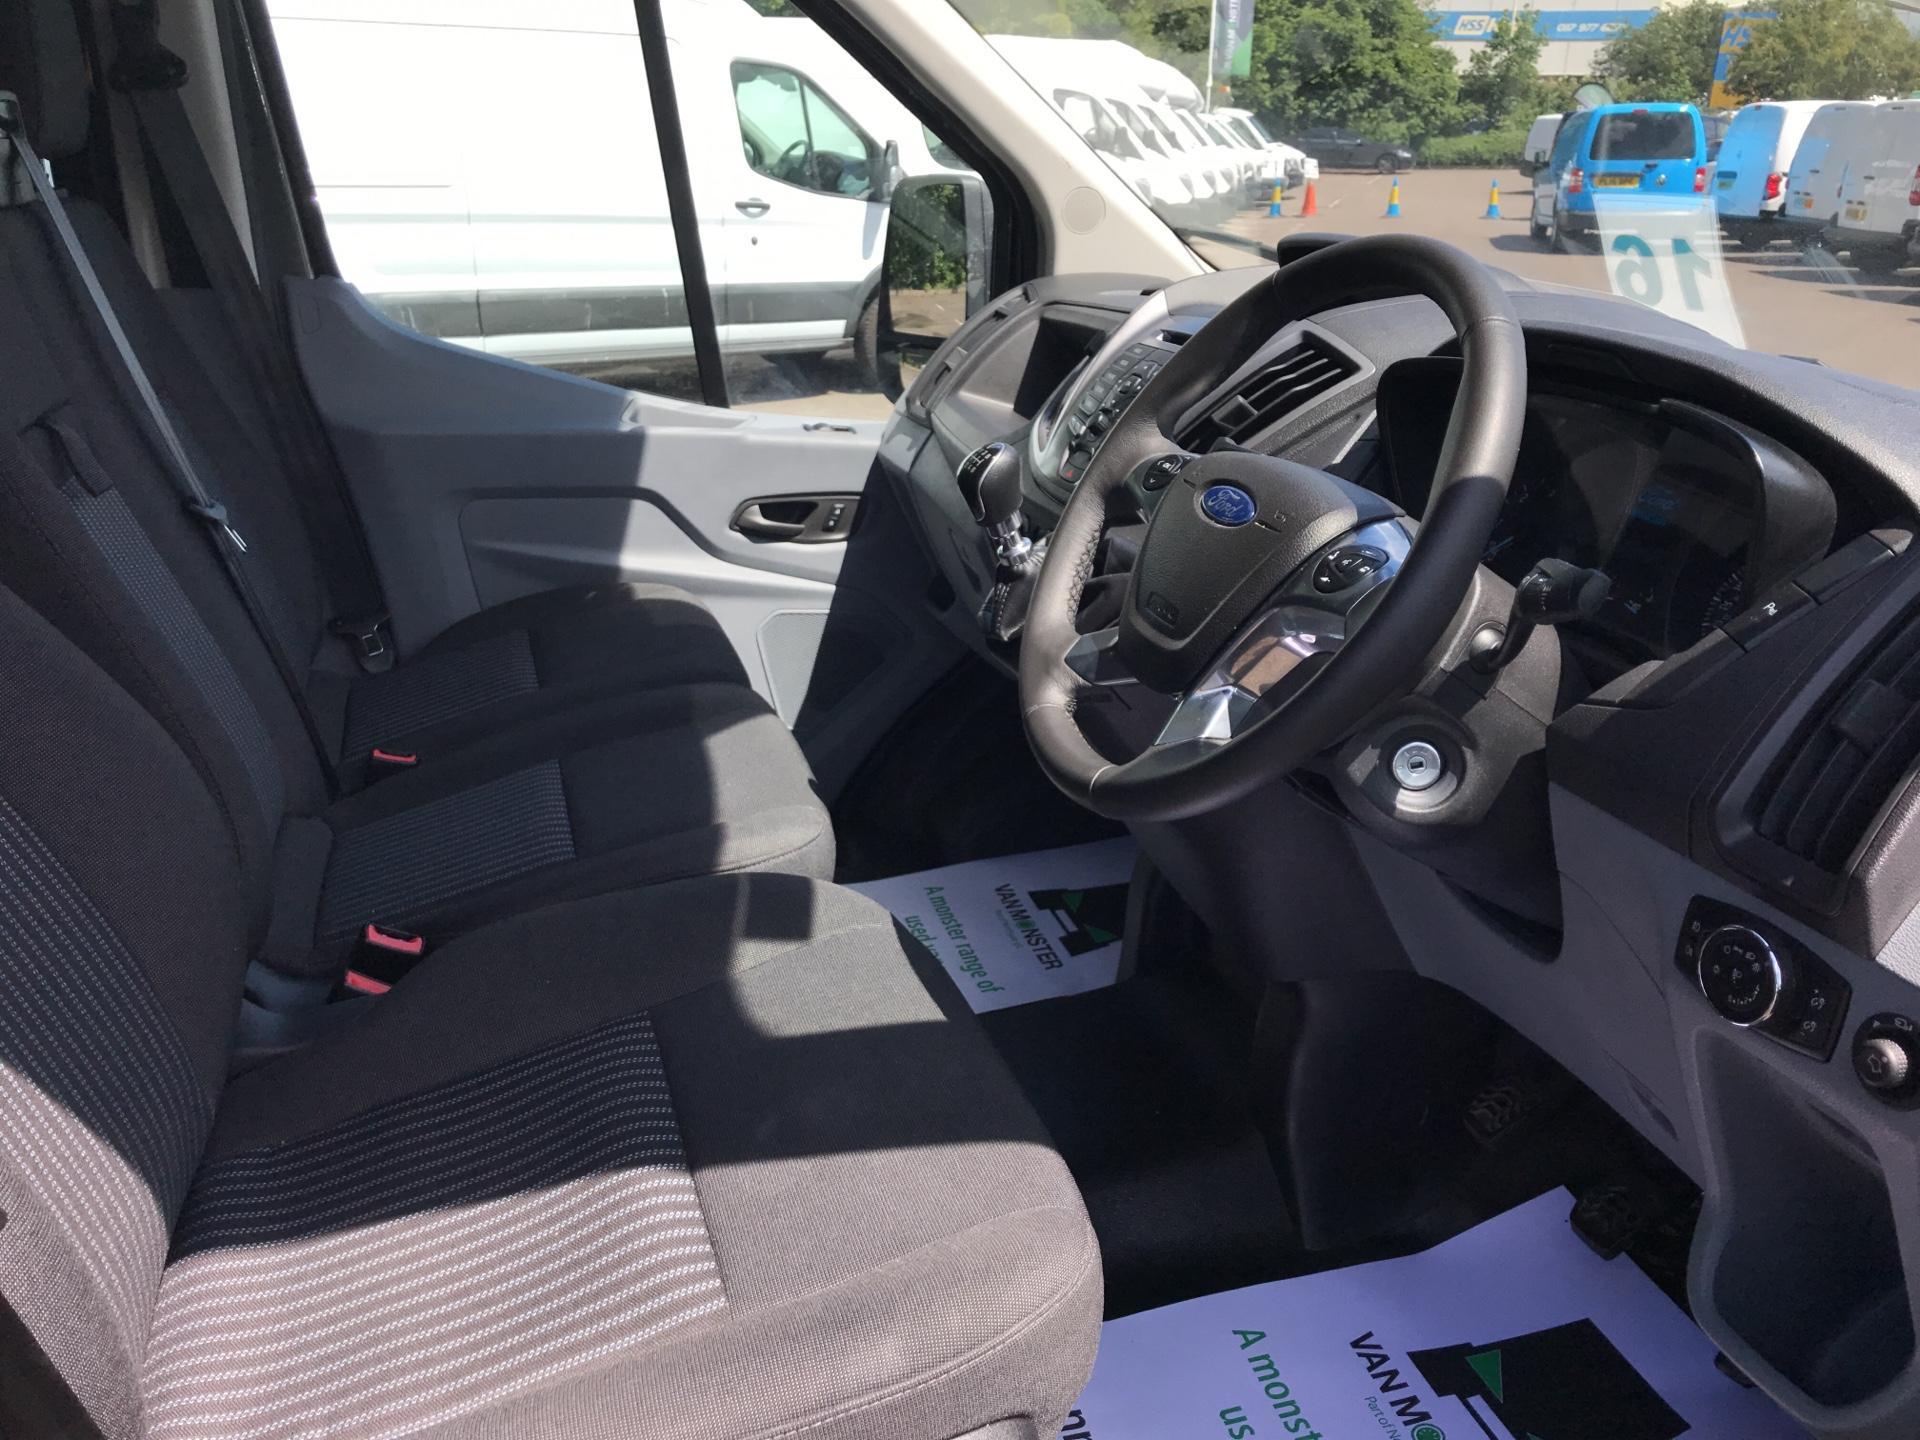 2018 Ford Transit 2.0 Tdci 130Ps H2 D/Cab Crew Van Euro 6 (WU68PXA) Image 9